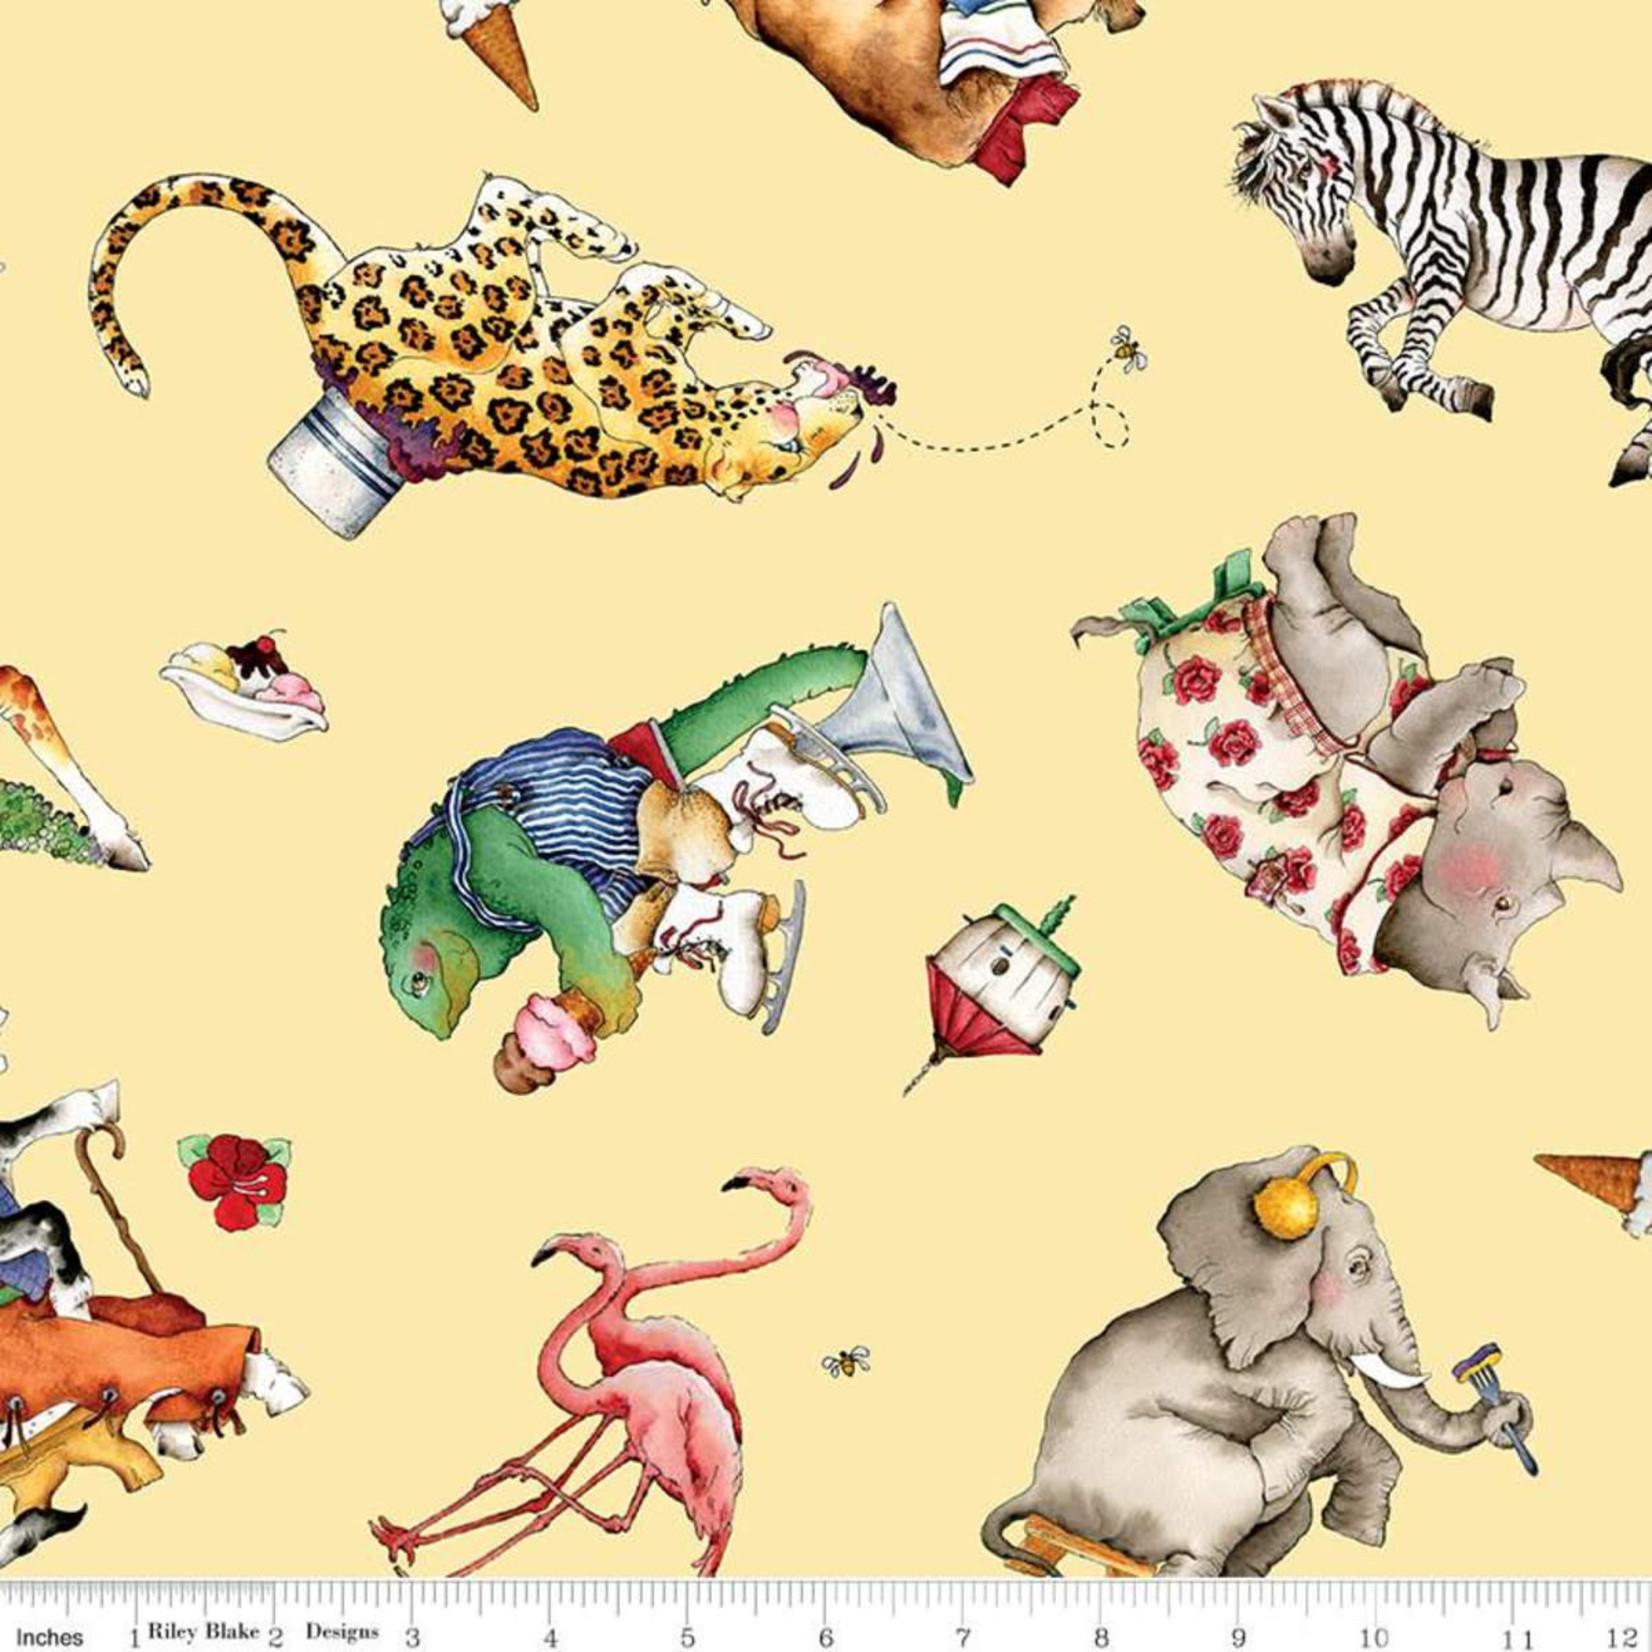 Riley Blake Designs 100cm Hungry Animal Alphabet, Tossed Animals, Yellow per cm or $22/m